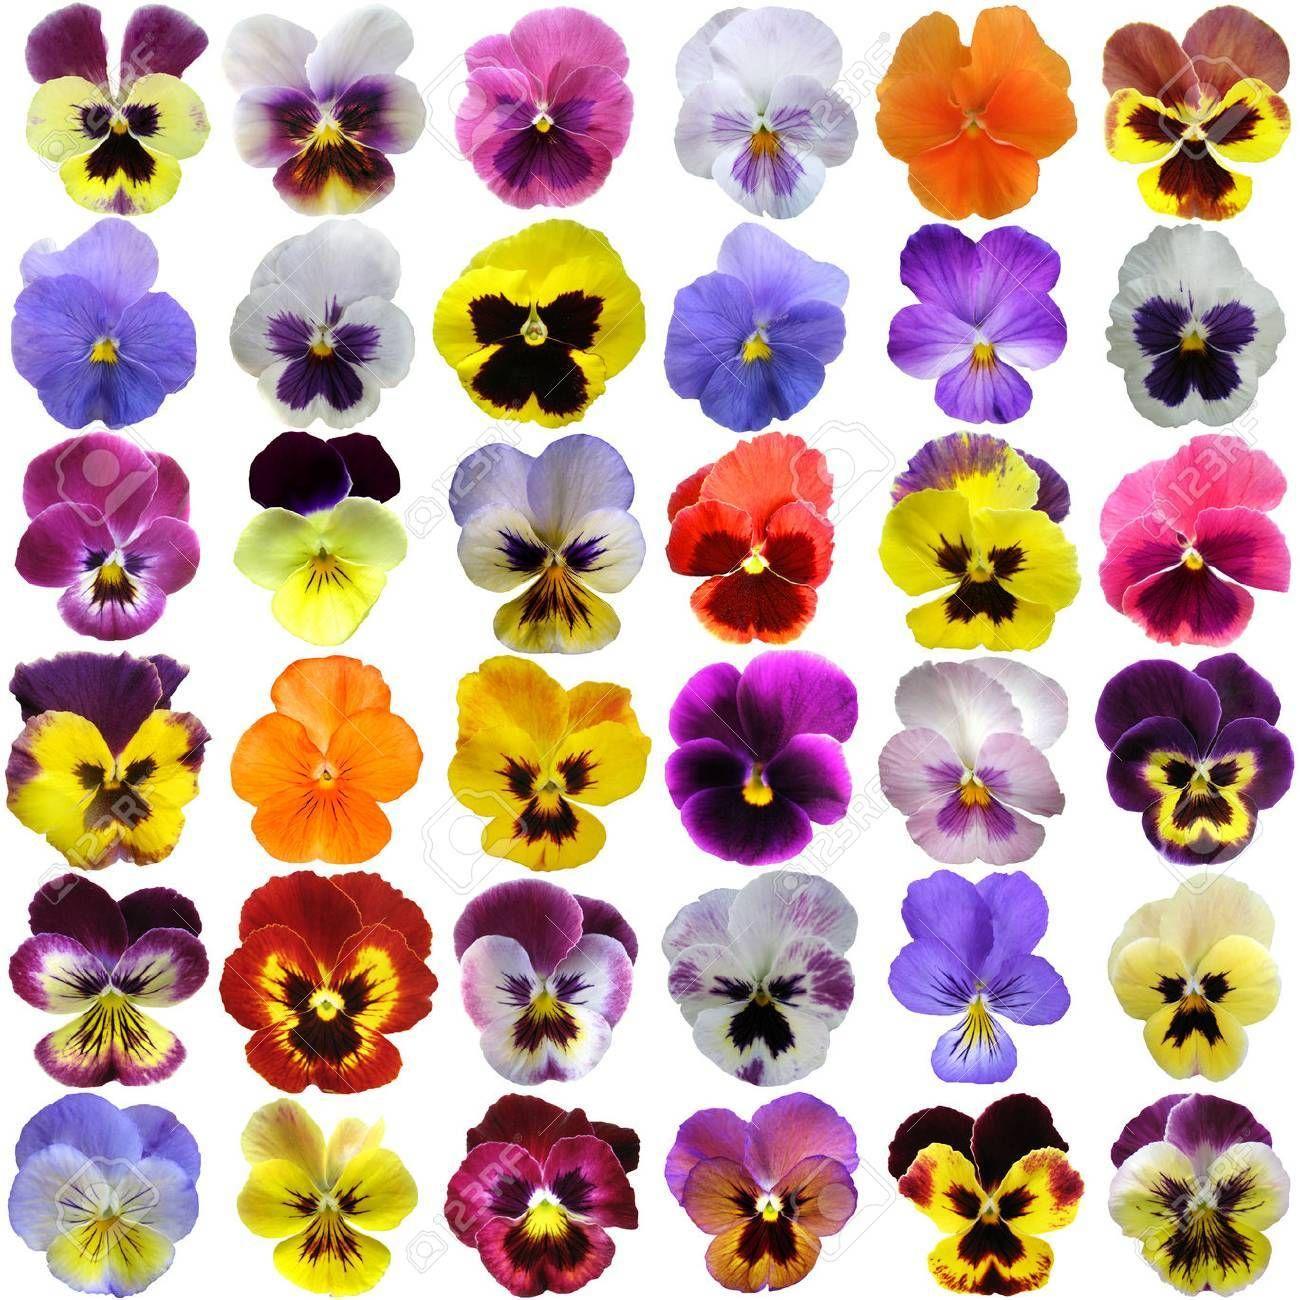 Pansies On White Background In 2020 Pansies Flowers Flower Painting Flower Art